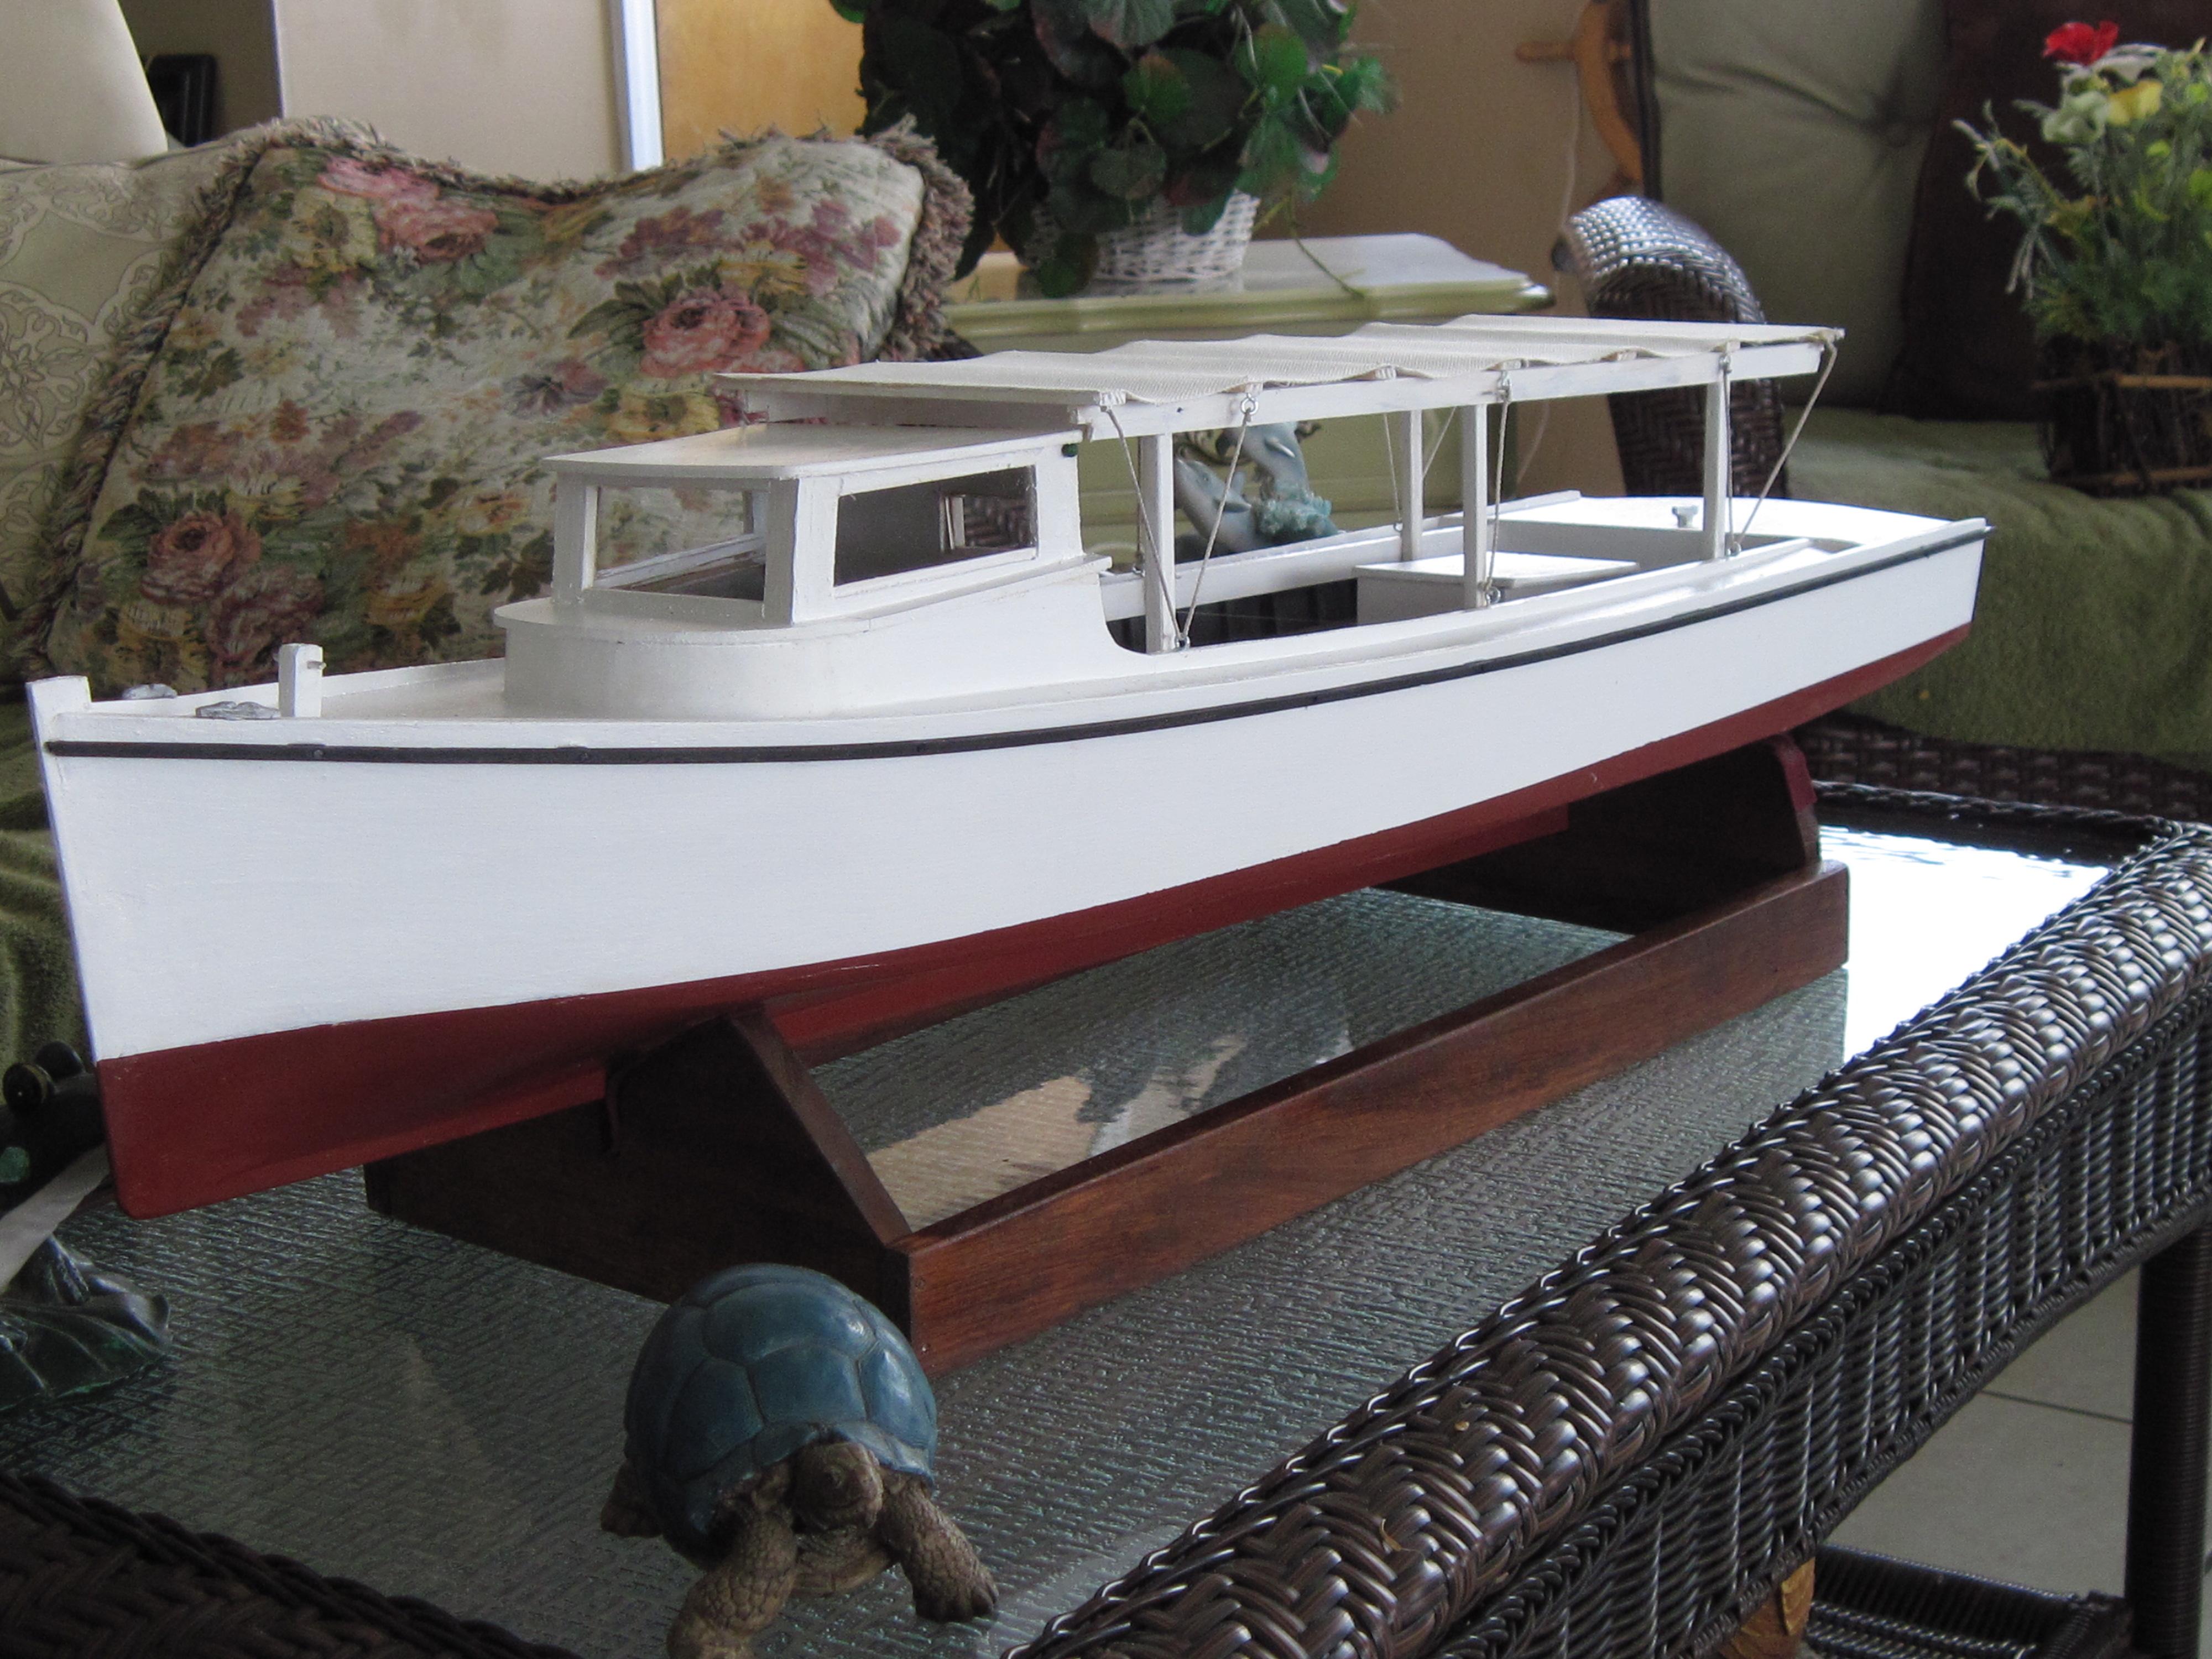 Chesapeake bay workboat (MISS ALISON) SOLD   John Marsdon Watkins   Foundmyself